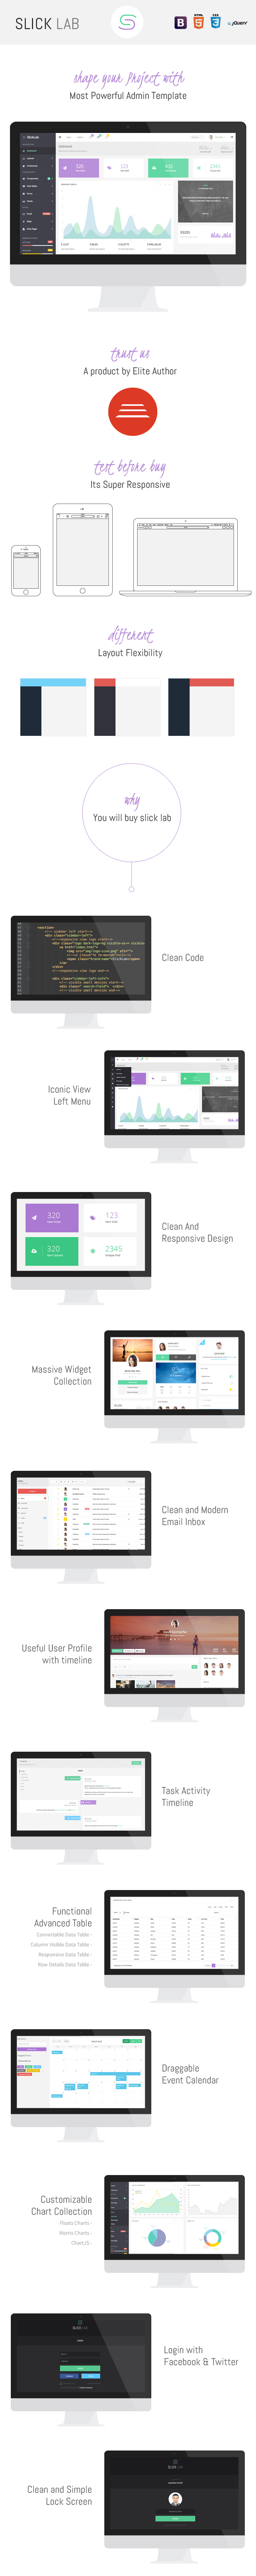 SlickLab - Responsive Admin Dashboard Template - 1